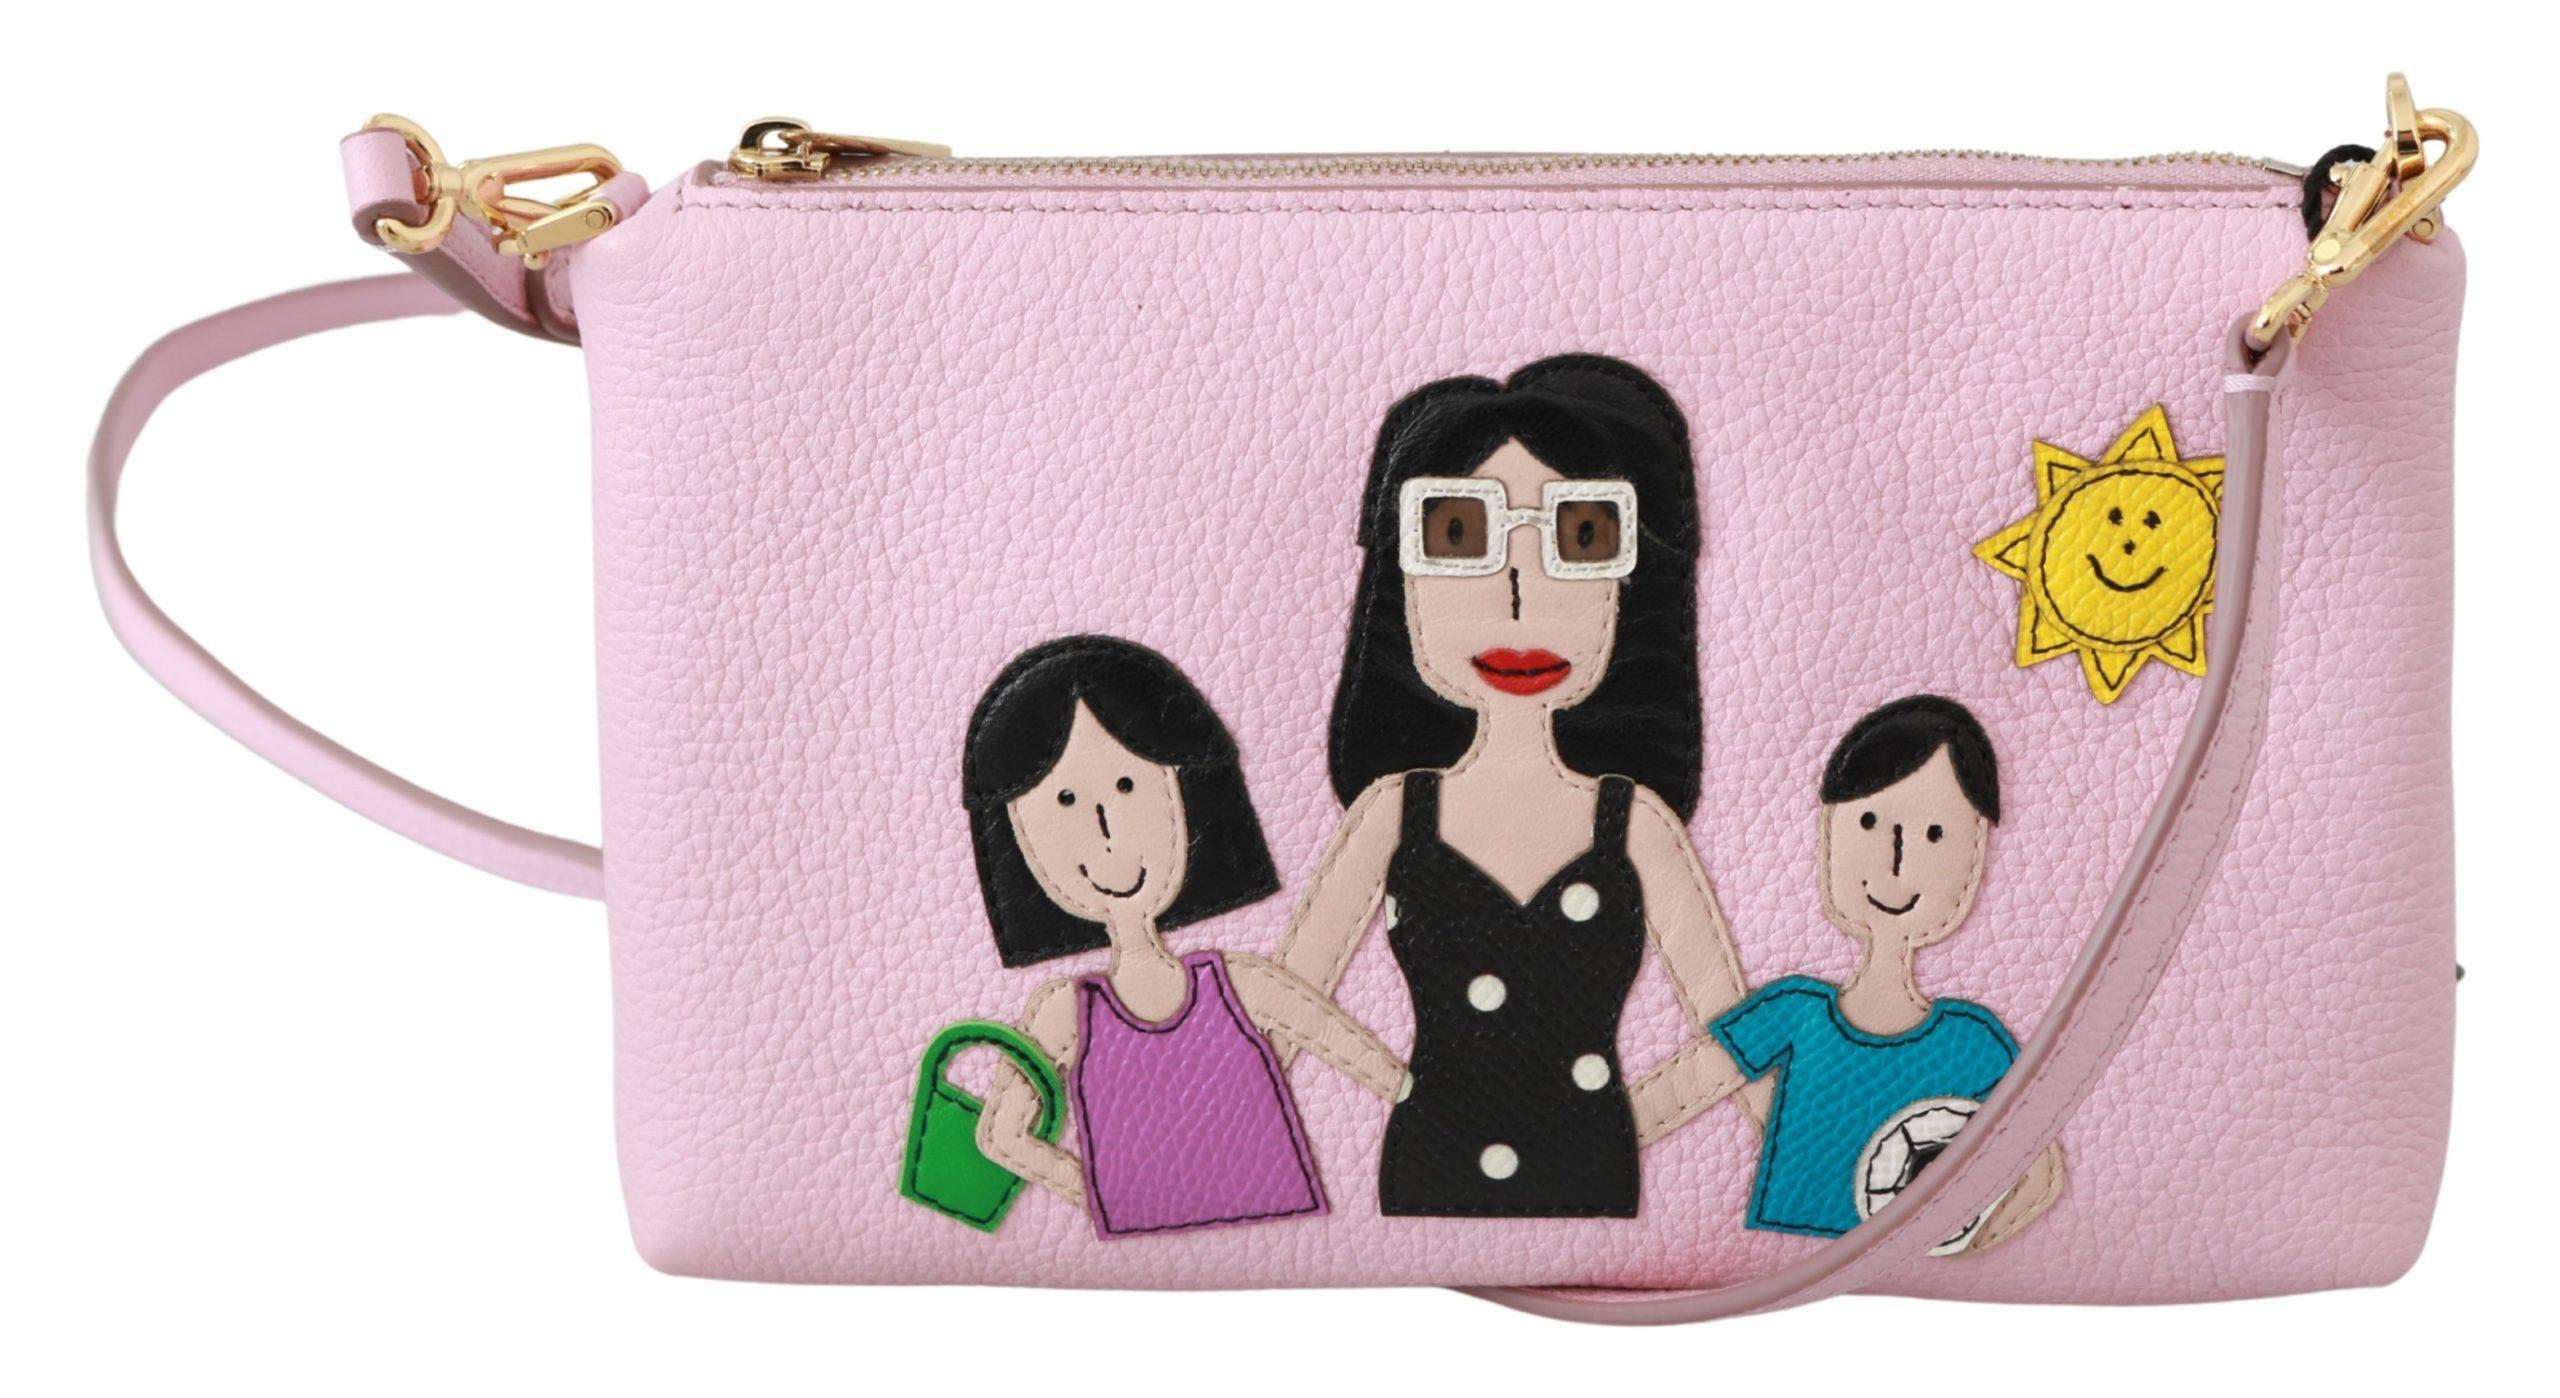 Dolce & Gabbana Women's Leather #dgfamily Clutch Bag Pink VAS9429